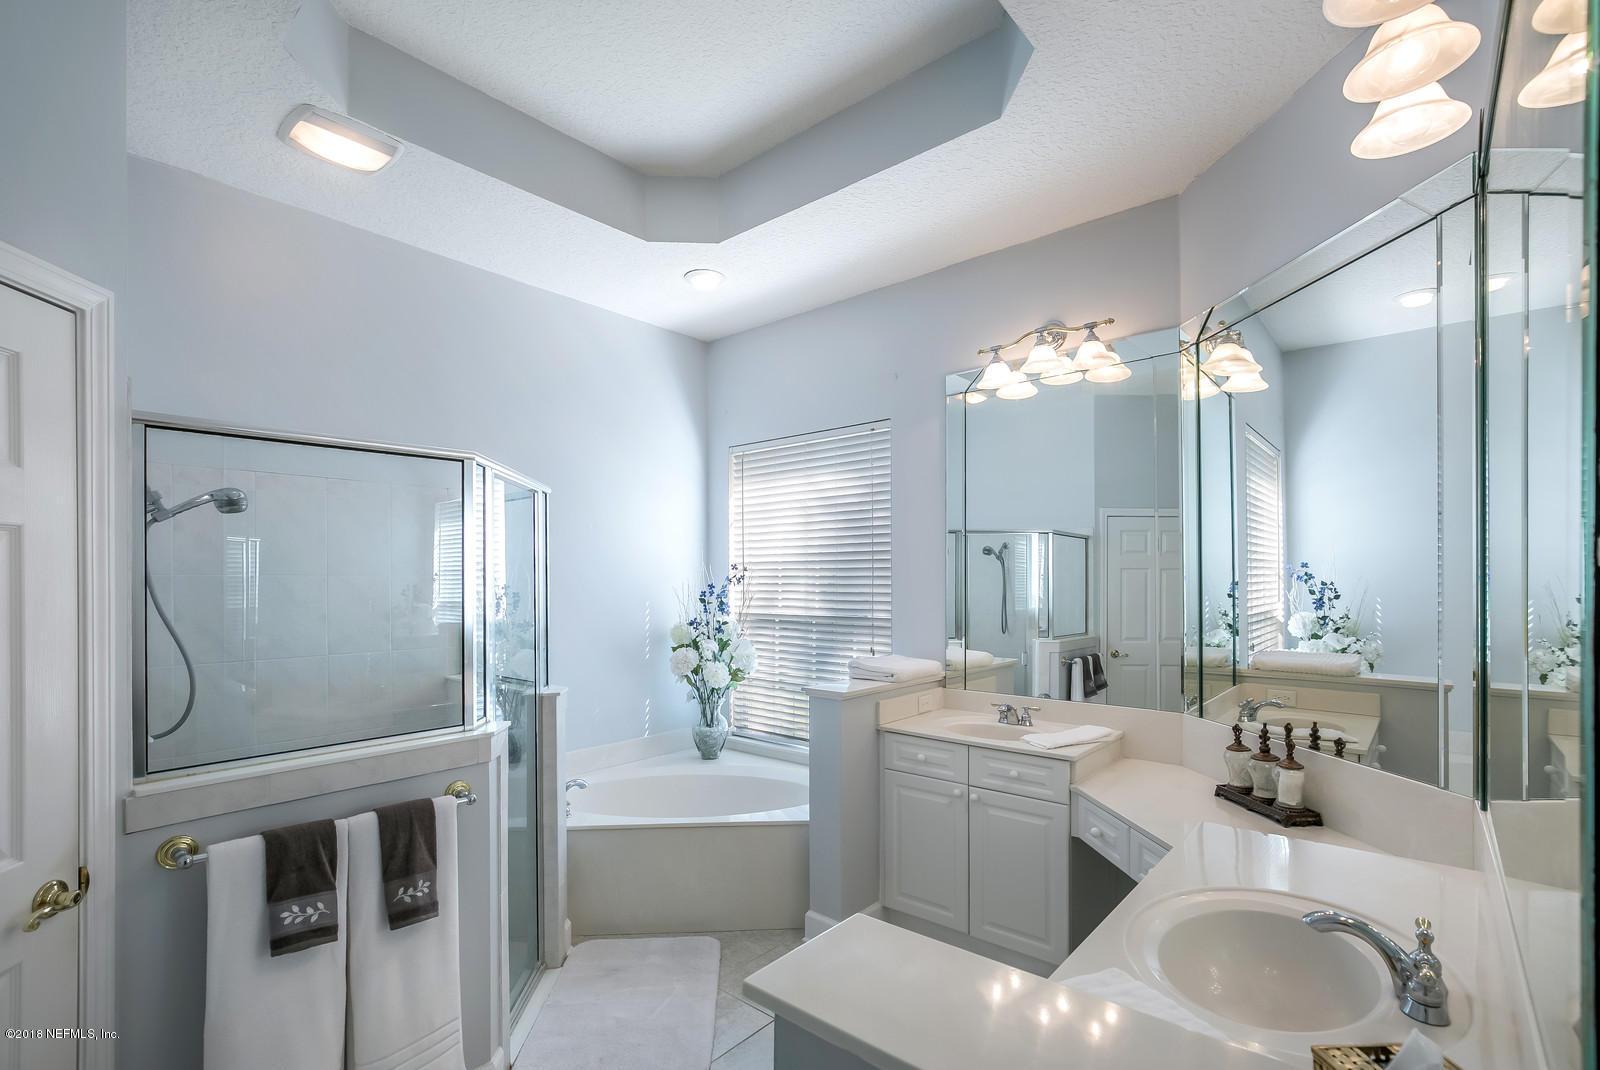 2449 STONEY GLEN, FLEMING ISLAND, FLORIDA 32003, 4 Bedrooms Bedrooms, ,3 BathroomsBathrooms,Residential - single family,For sale,STONEY GLEN,928494